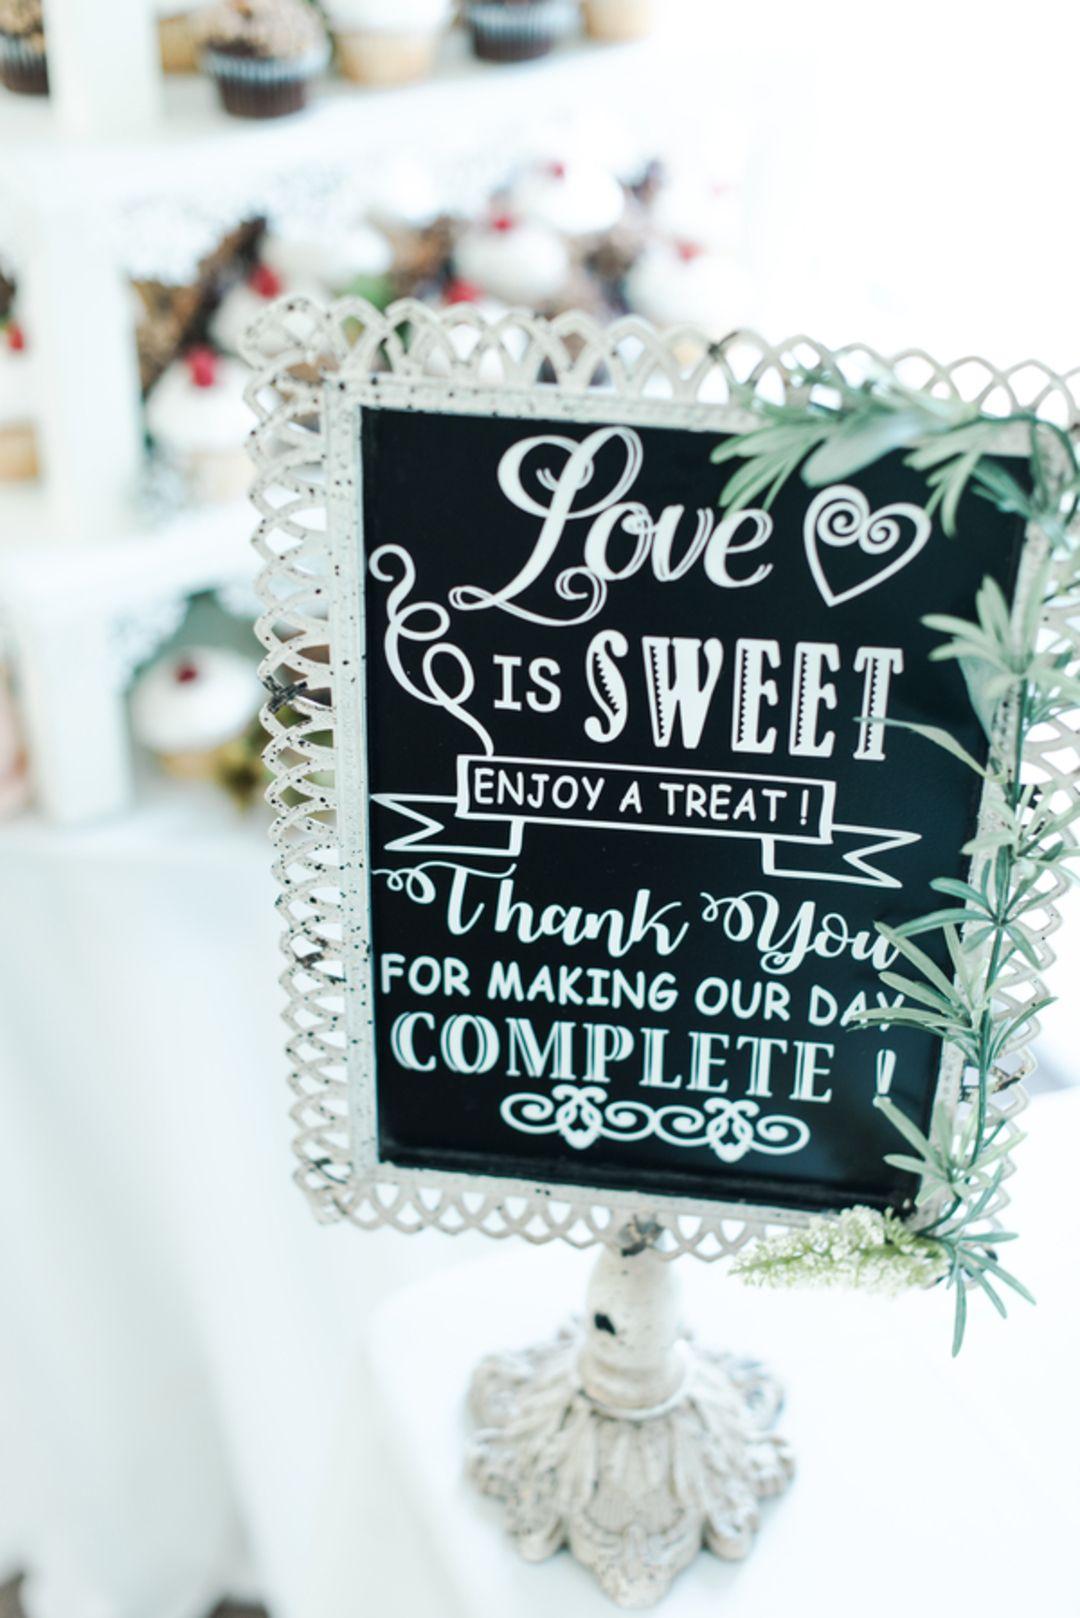 Wedding venues in virginia beach va  Natural Wedding at Graeme Park  Horsham PA in   Wedding Cake